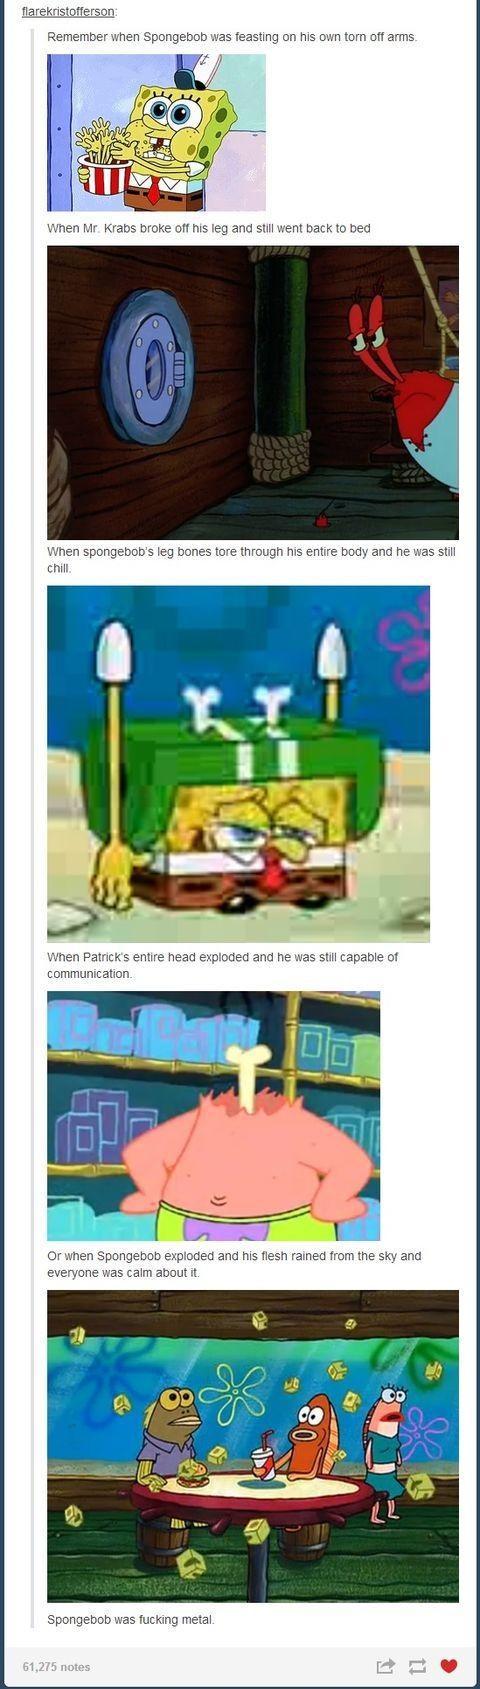 20 best spongebob images on pinterest spongebob squarepants